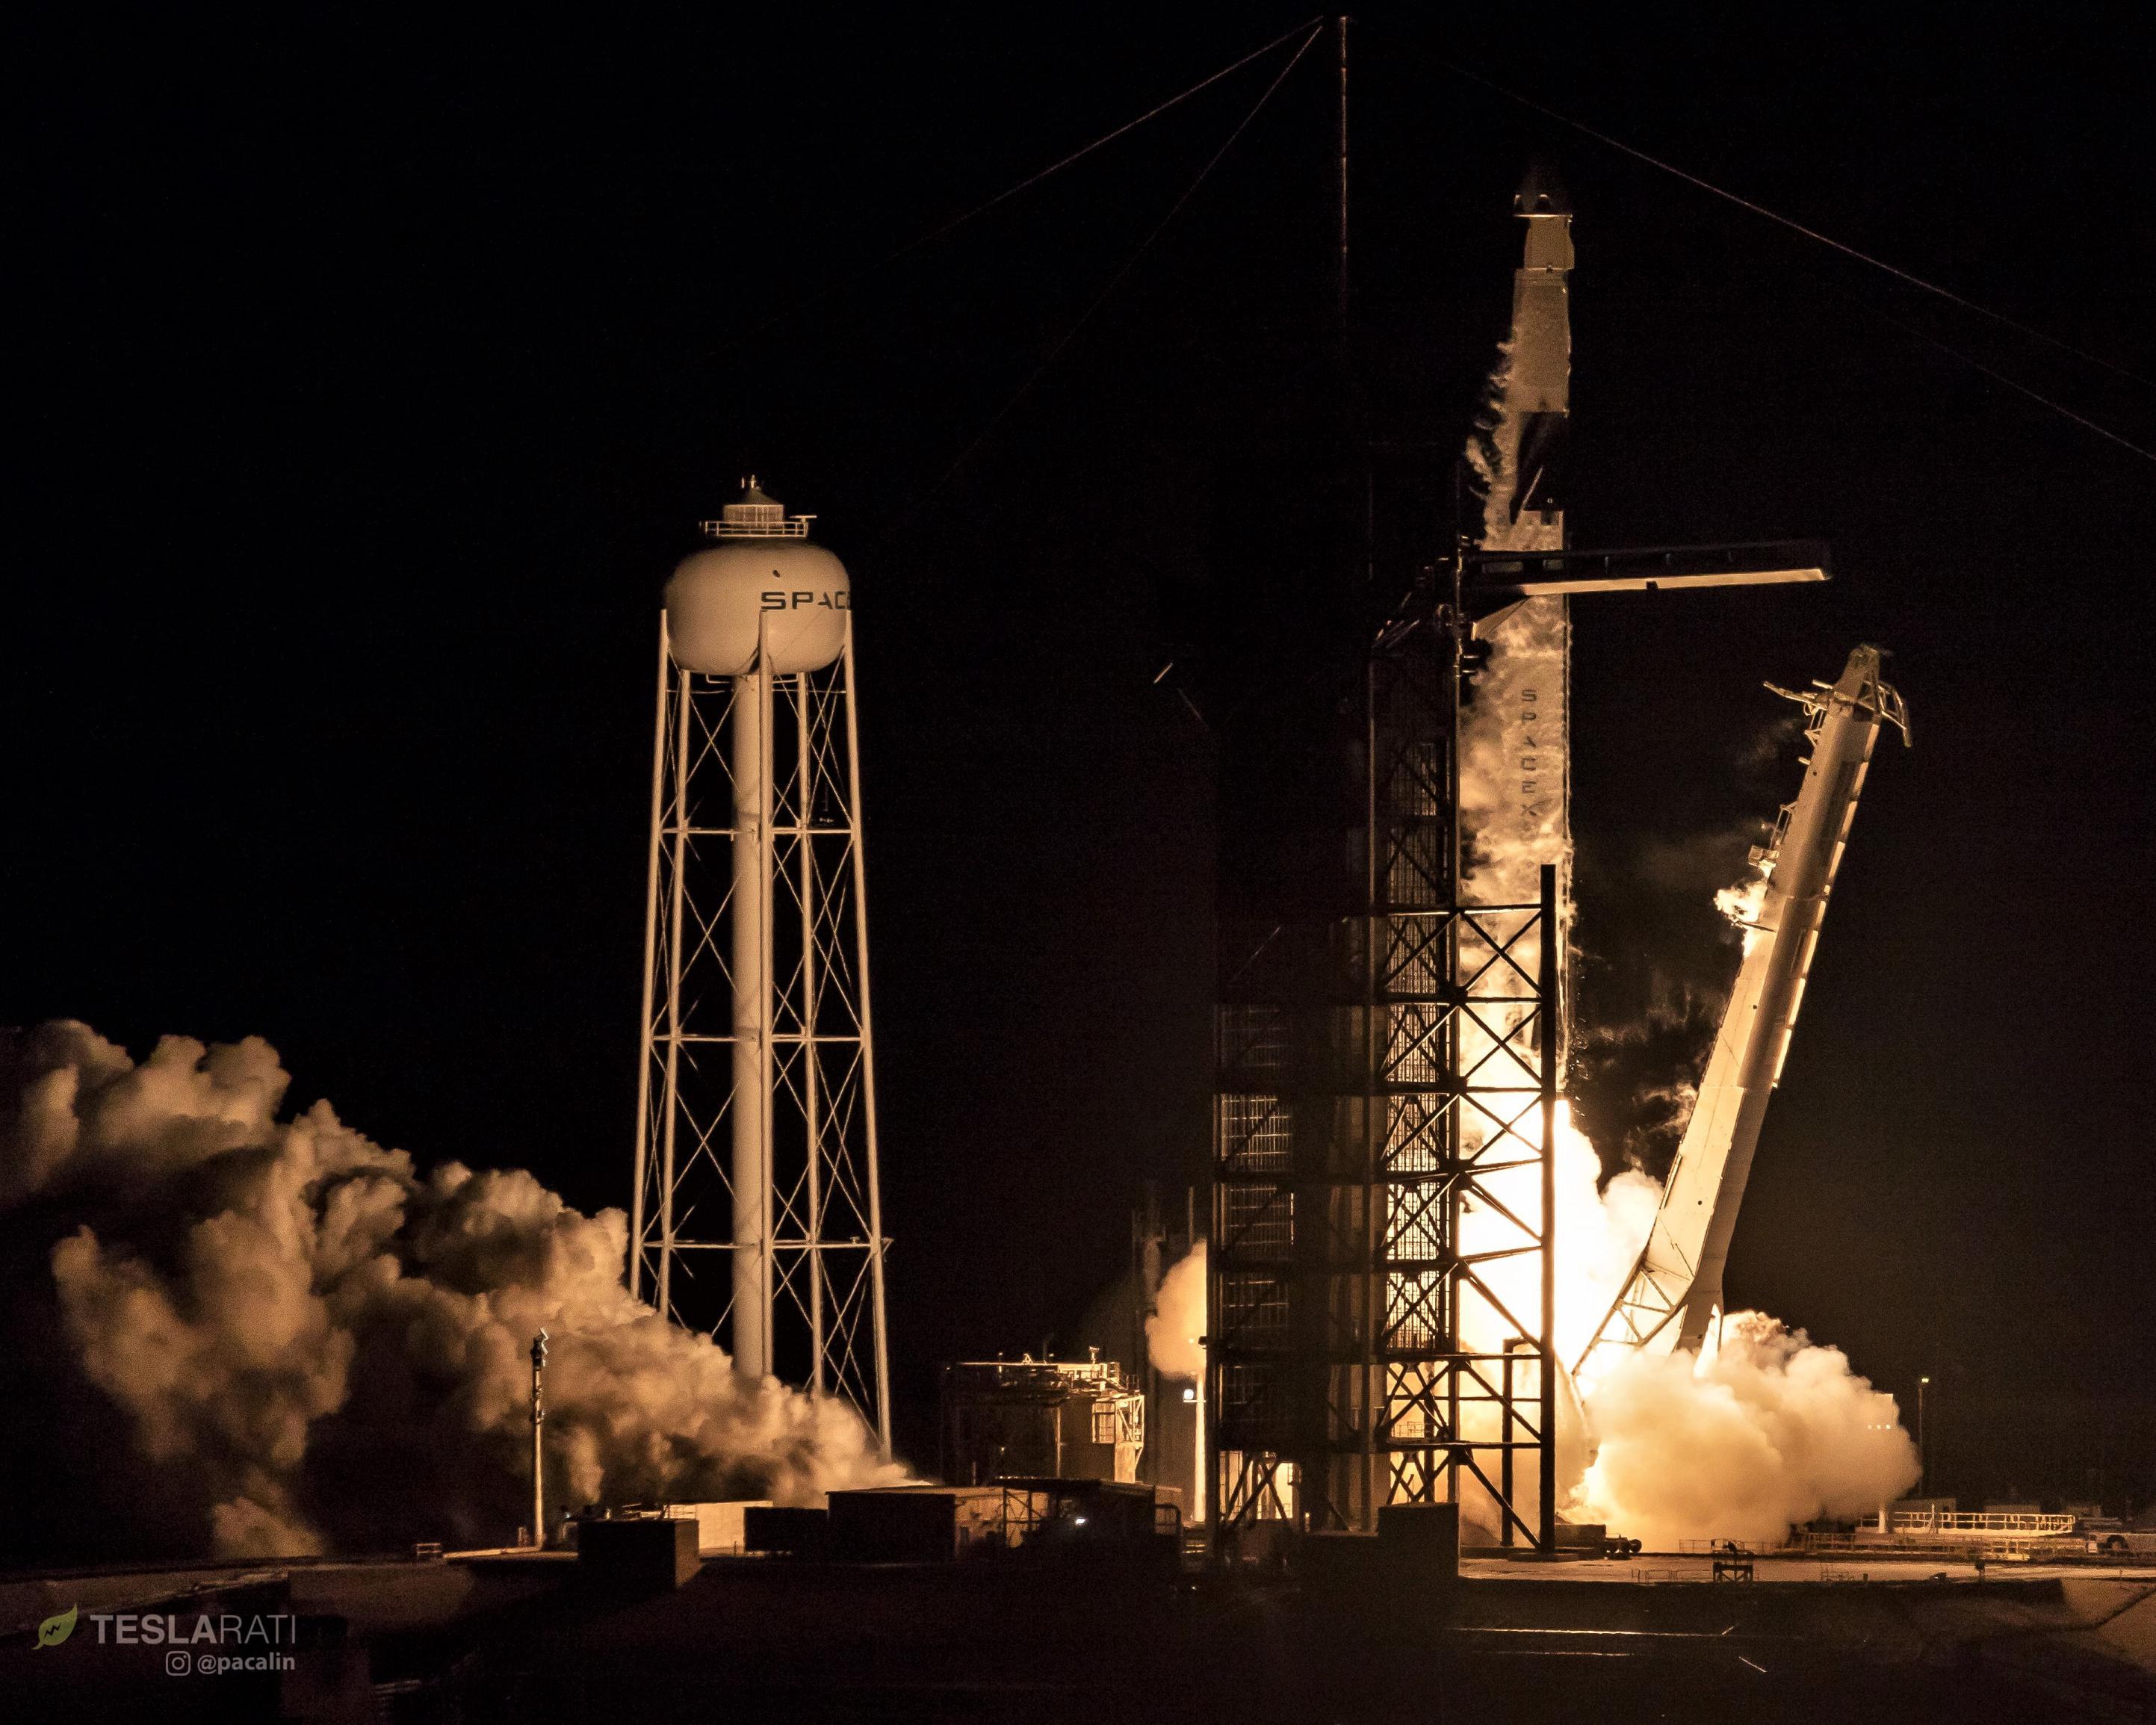 Crew Dragon Falcon 9 B1051 DM-1 liftoff 030219 (Pauline Acalin) 1 (c)